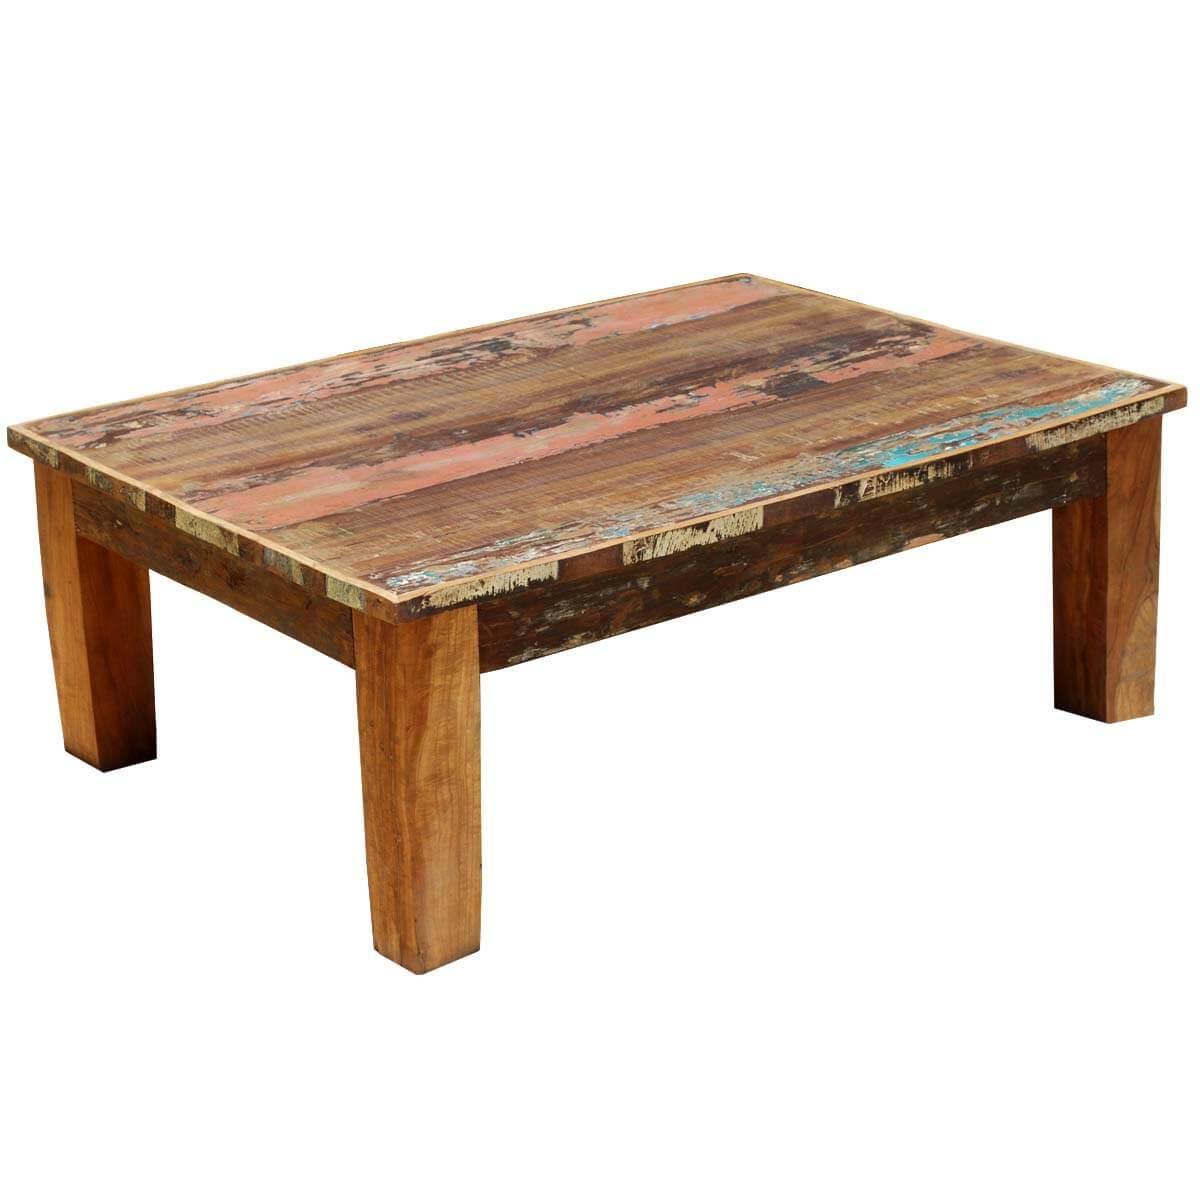 Appalachian Rustic Mixed Reclaimed Wood Coffee Table